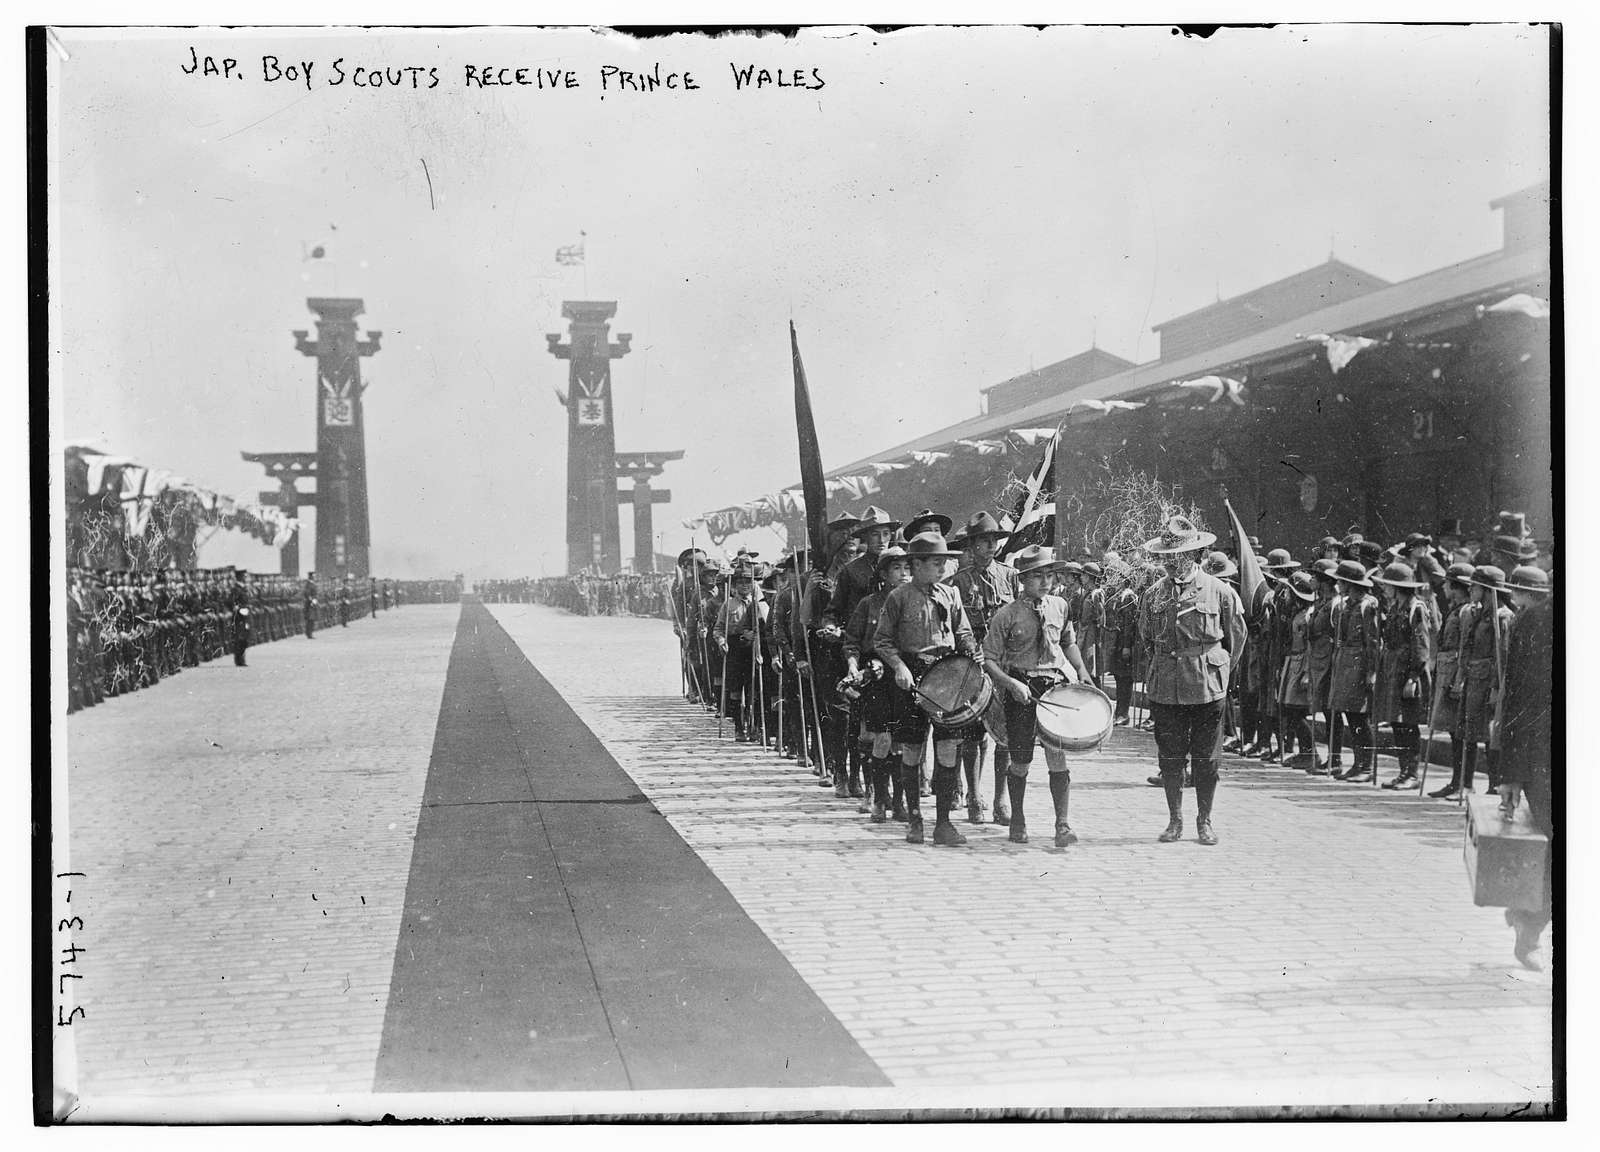 Japanese Boy Scouts receive Prince Wales